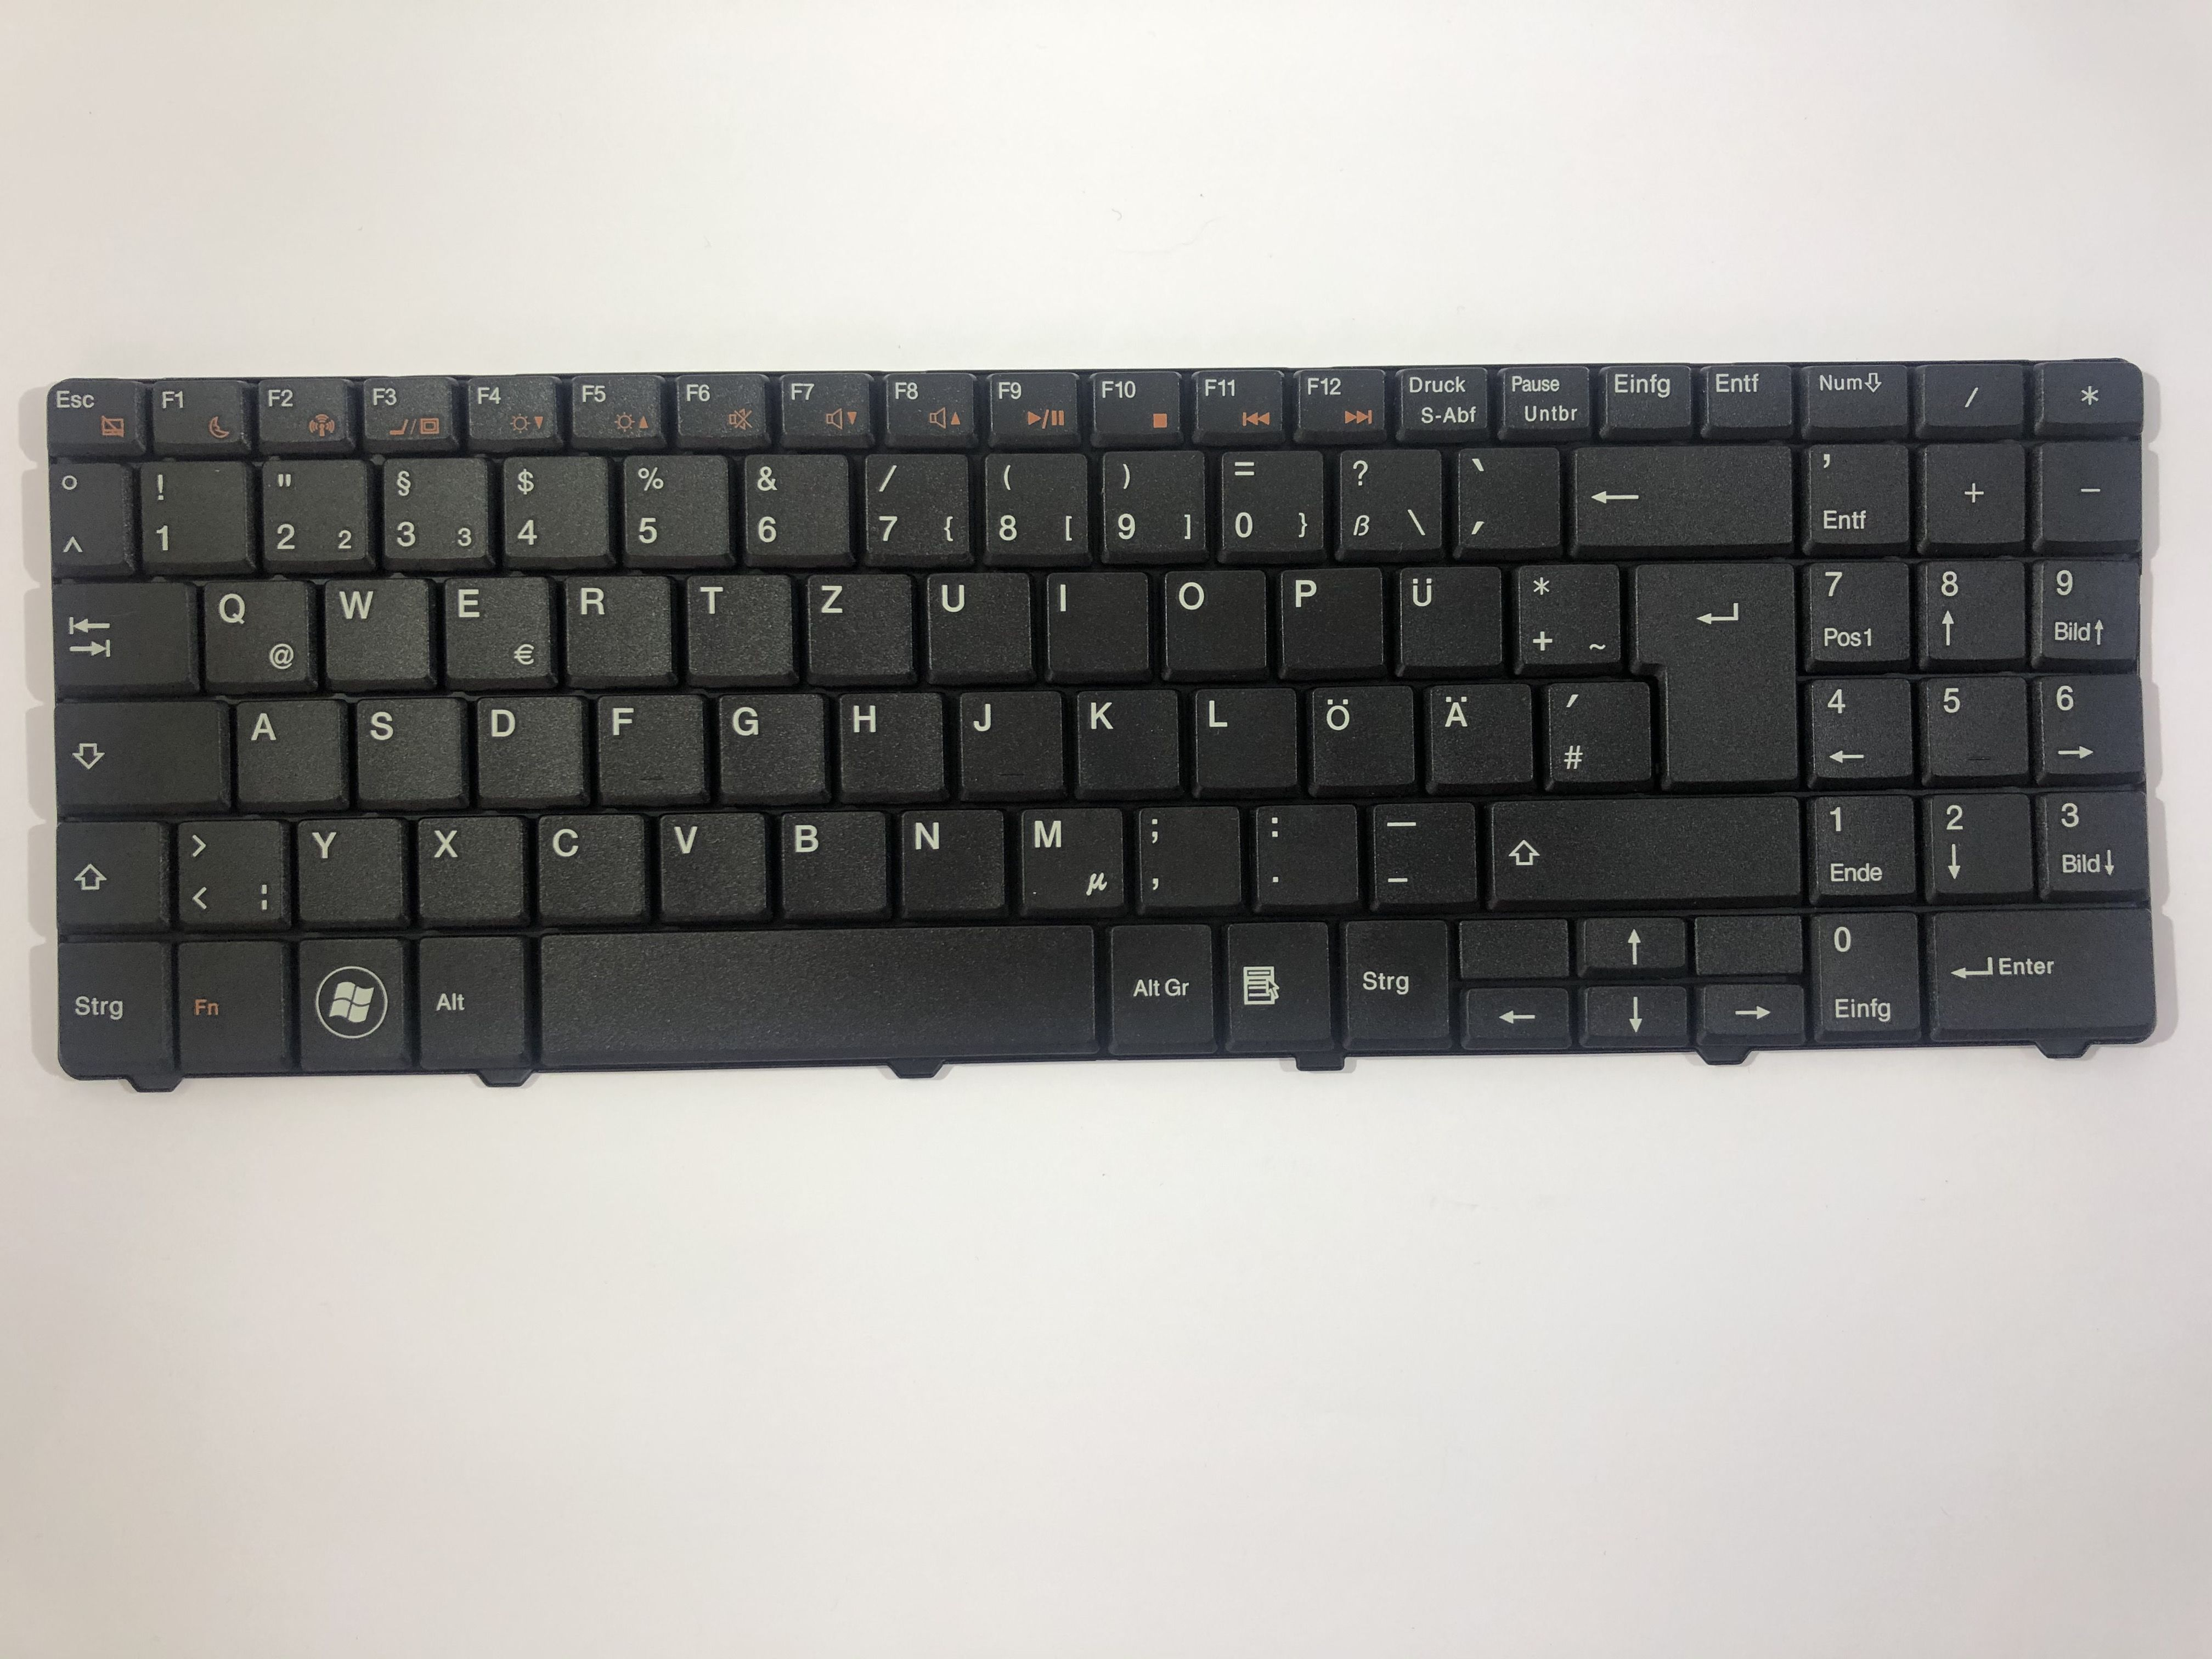 Tastatur Acer MP-08G66D0-6982 Aspire 5332 5334 5516 5517 5532 5534 5541 5541G 5732Z 5732ZG 5734 5734Z 7315 7715 7715Z